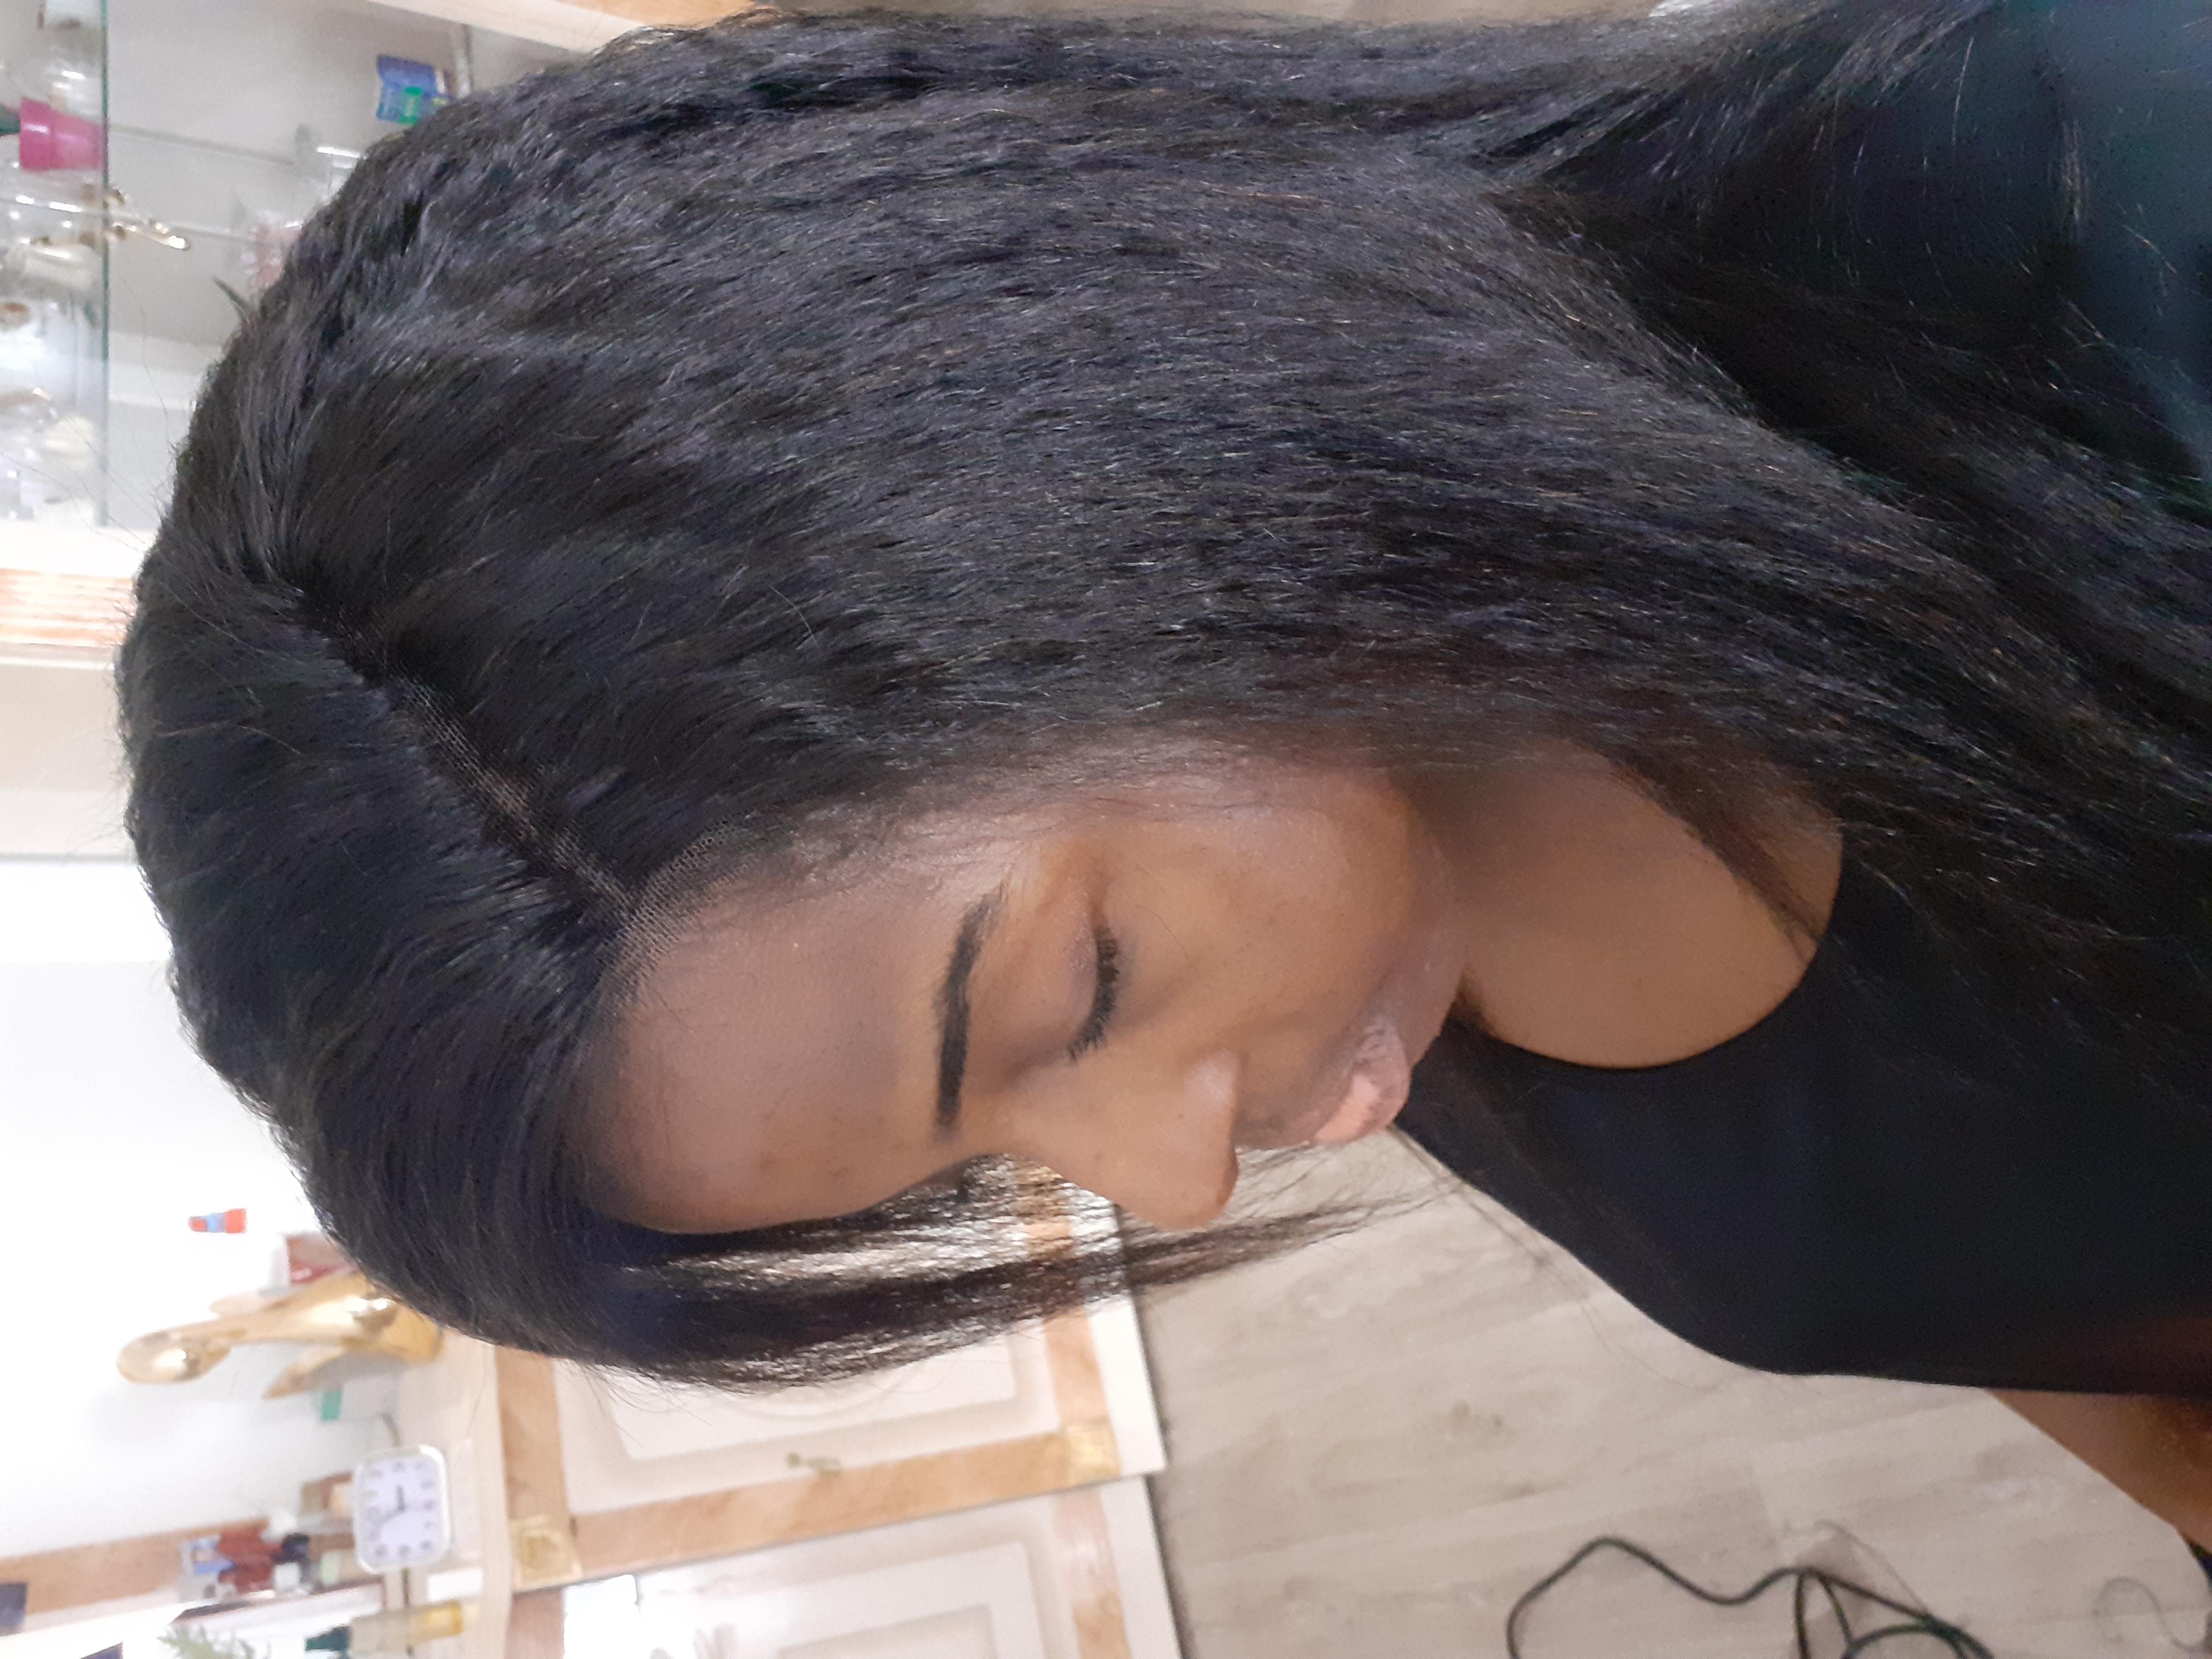 salon de coiffure afro tresse tresses box braids crochet braids vanilles tissages paris 75 77 78 91 92 93 94 95 ADWEJIAA